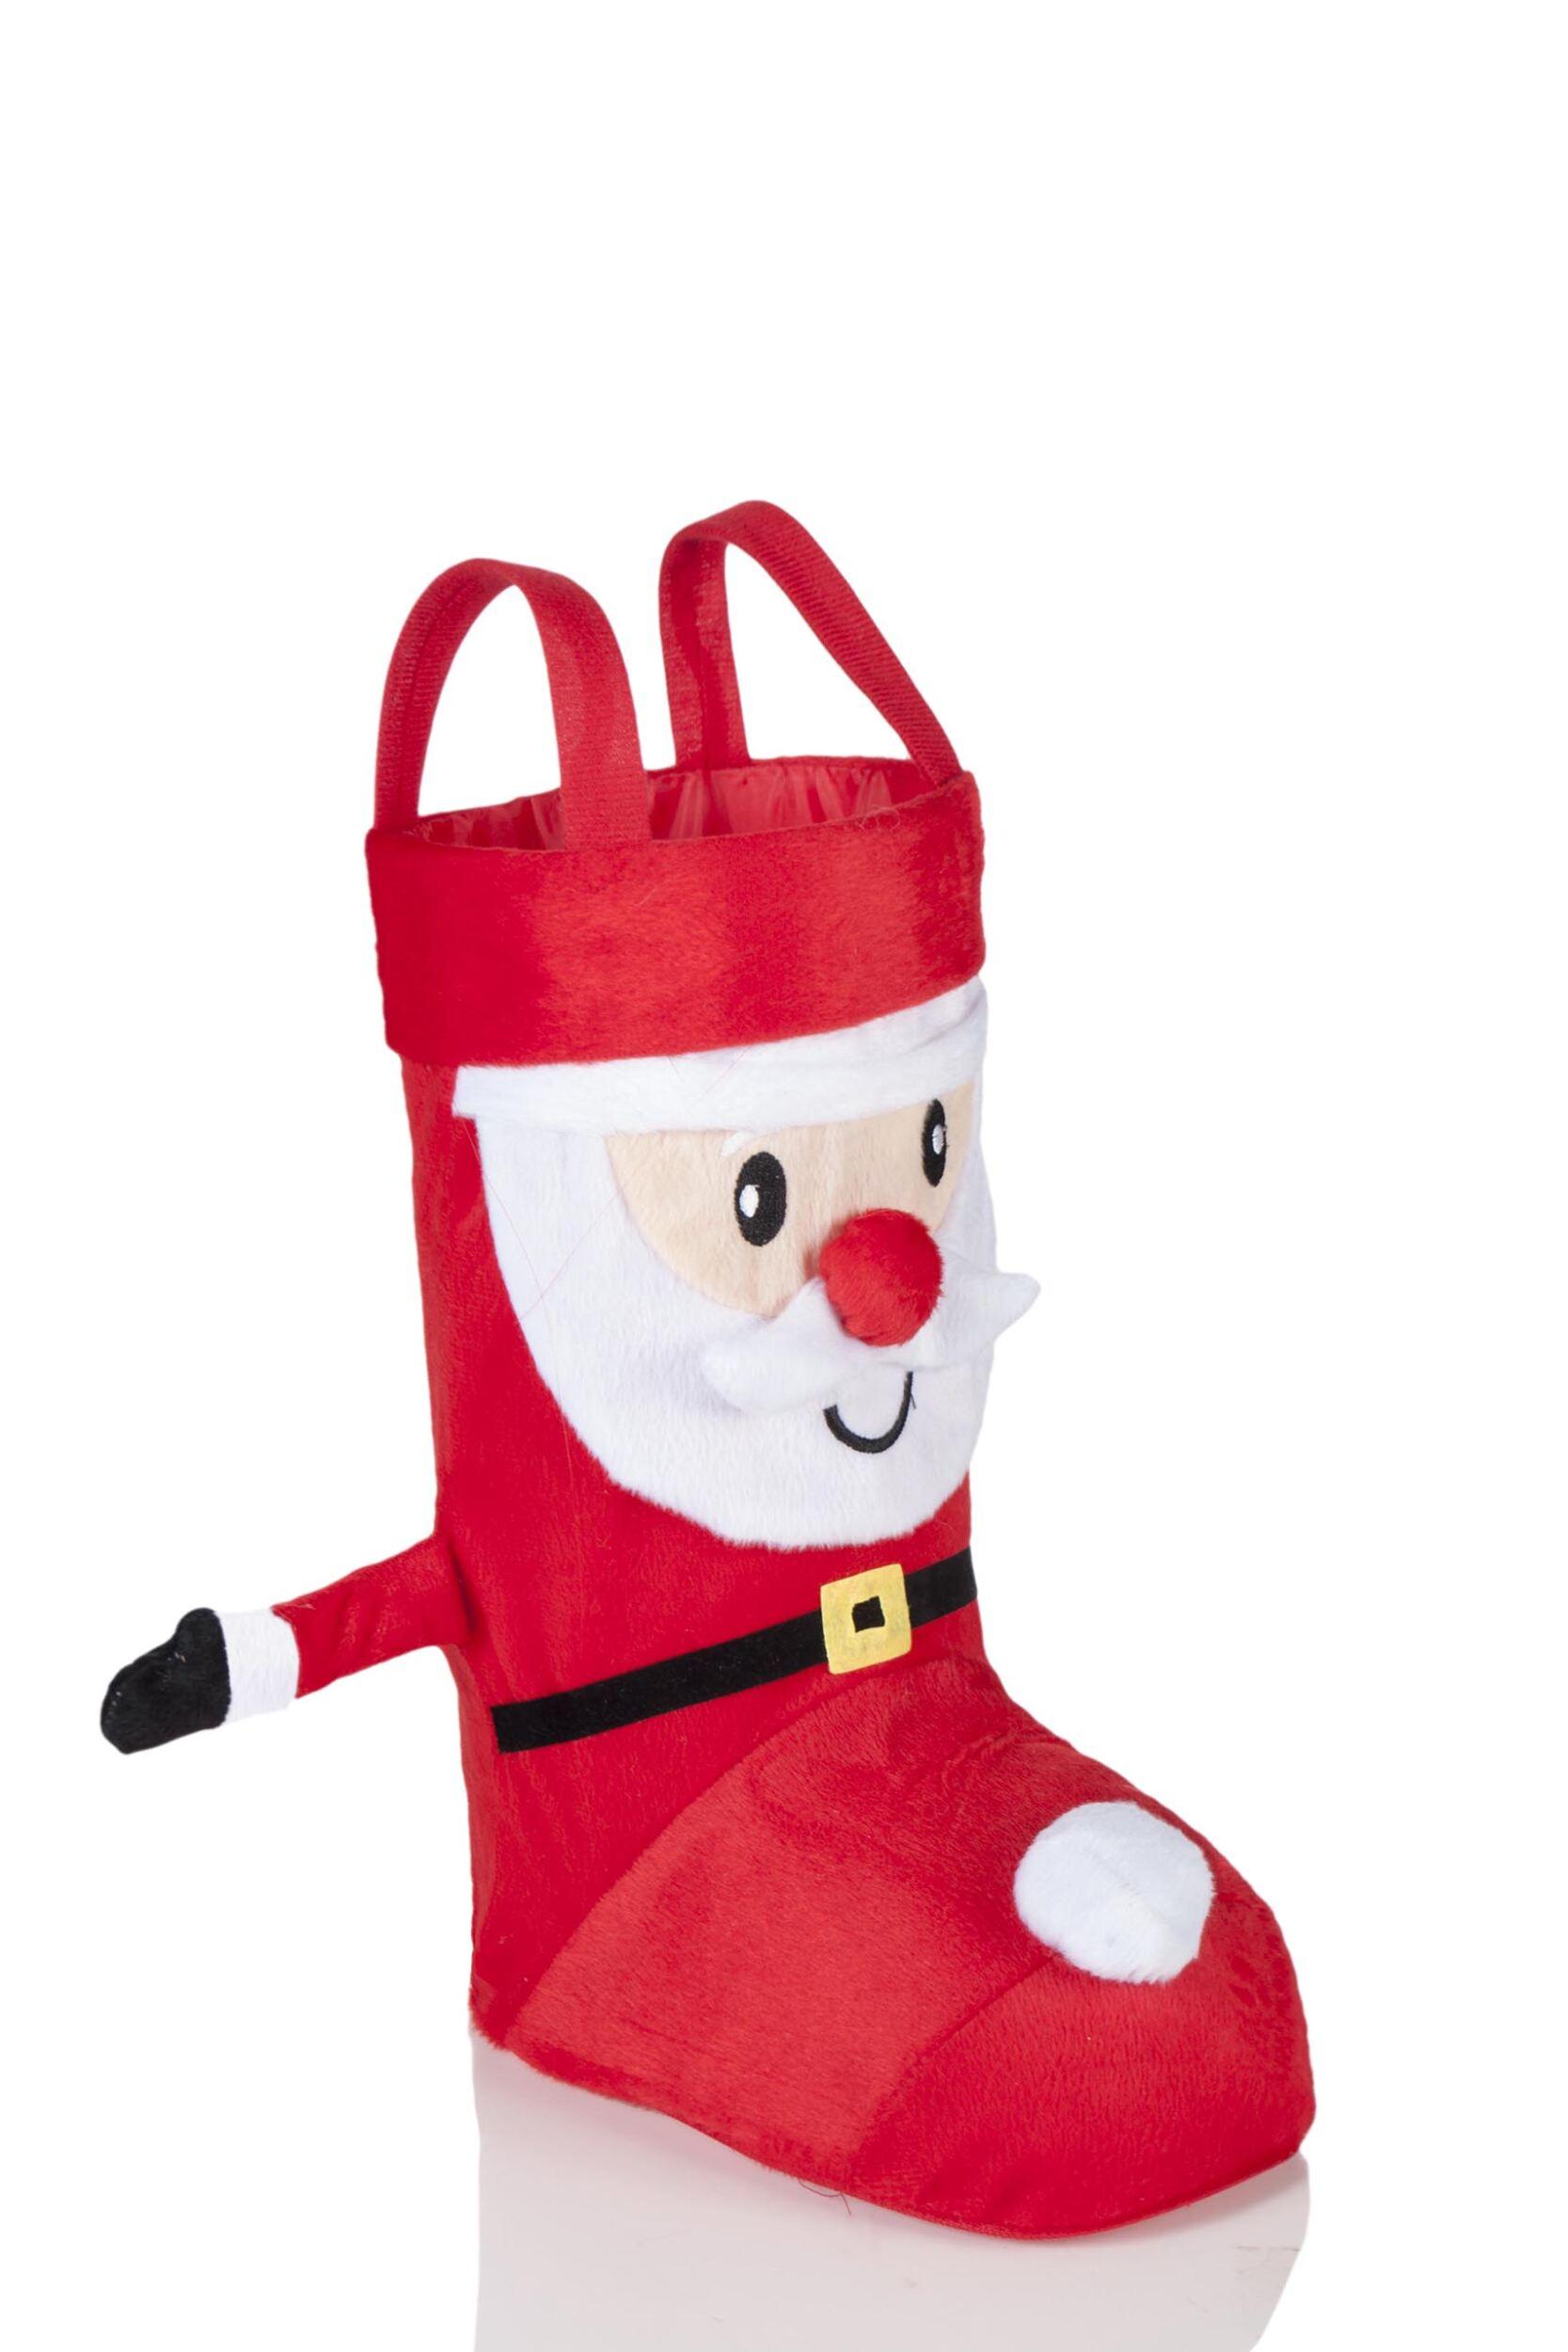 SockShop 3D Santa Christmas Stocking Bag